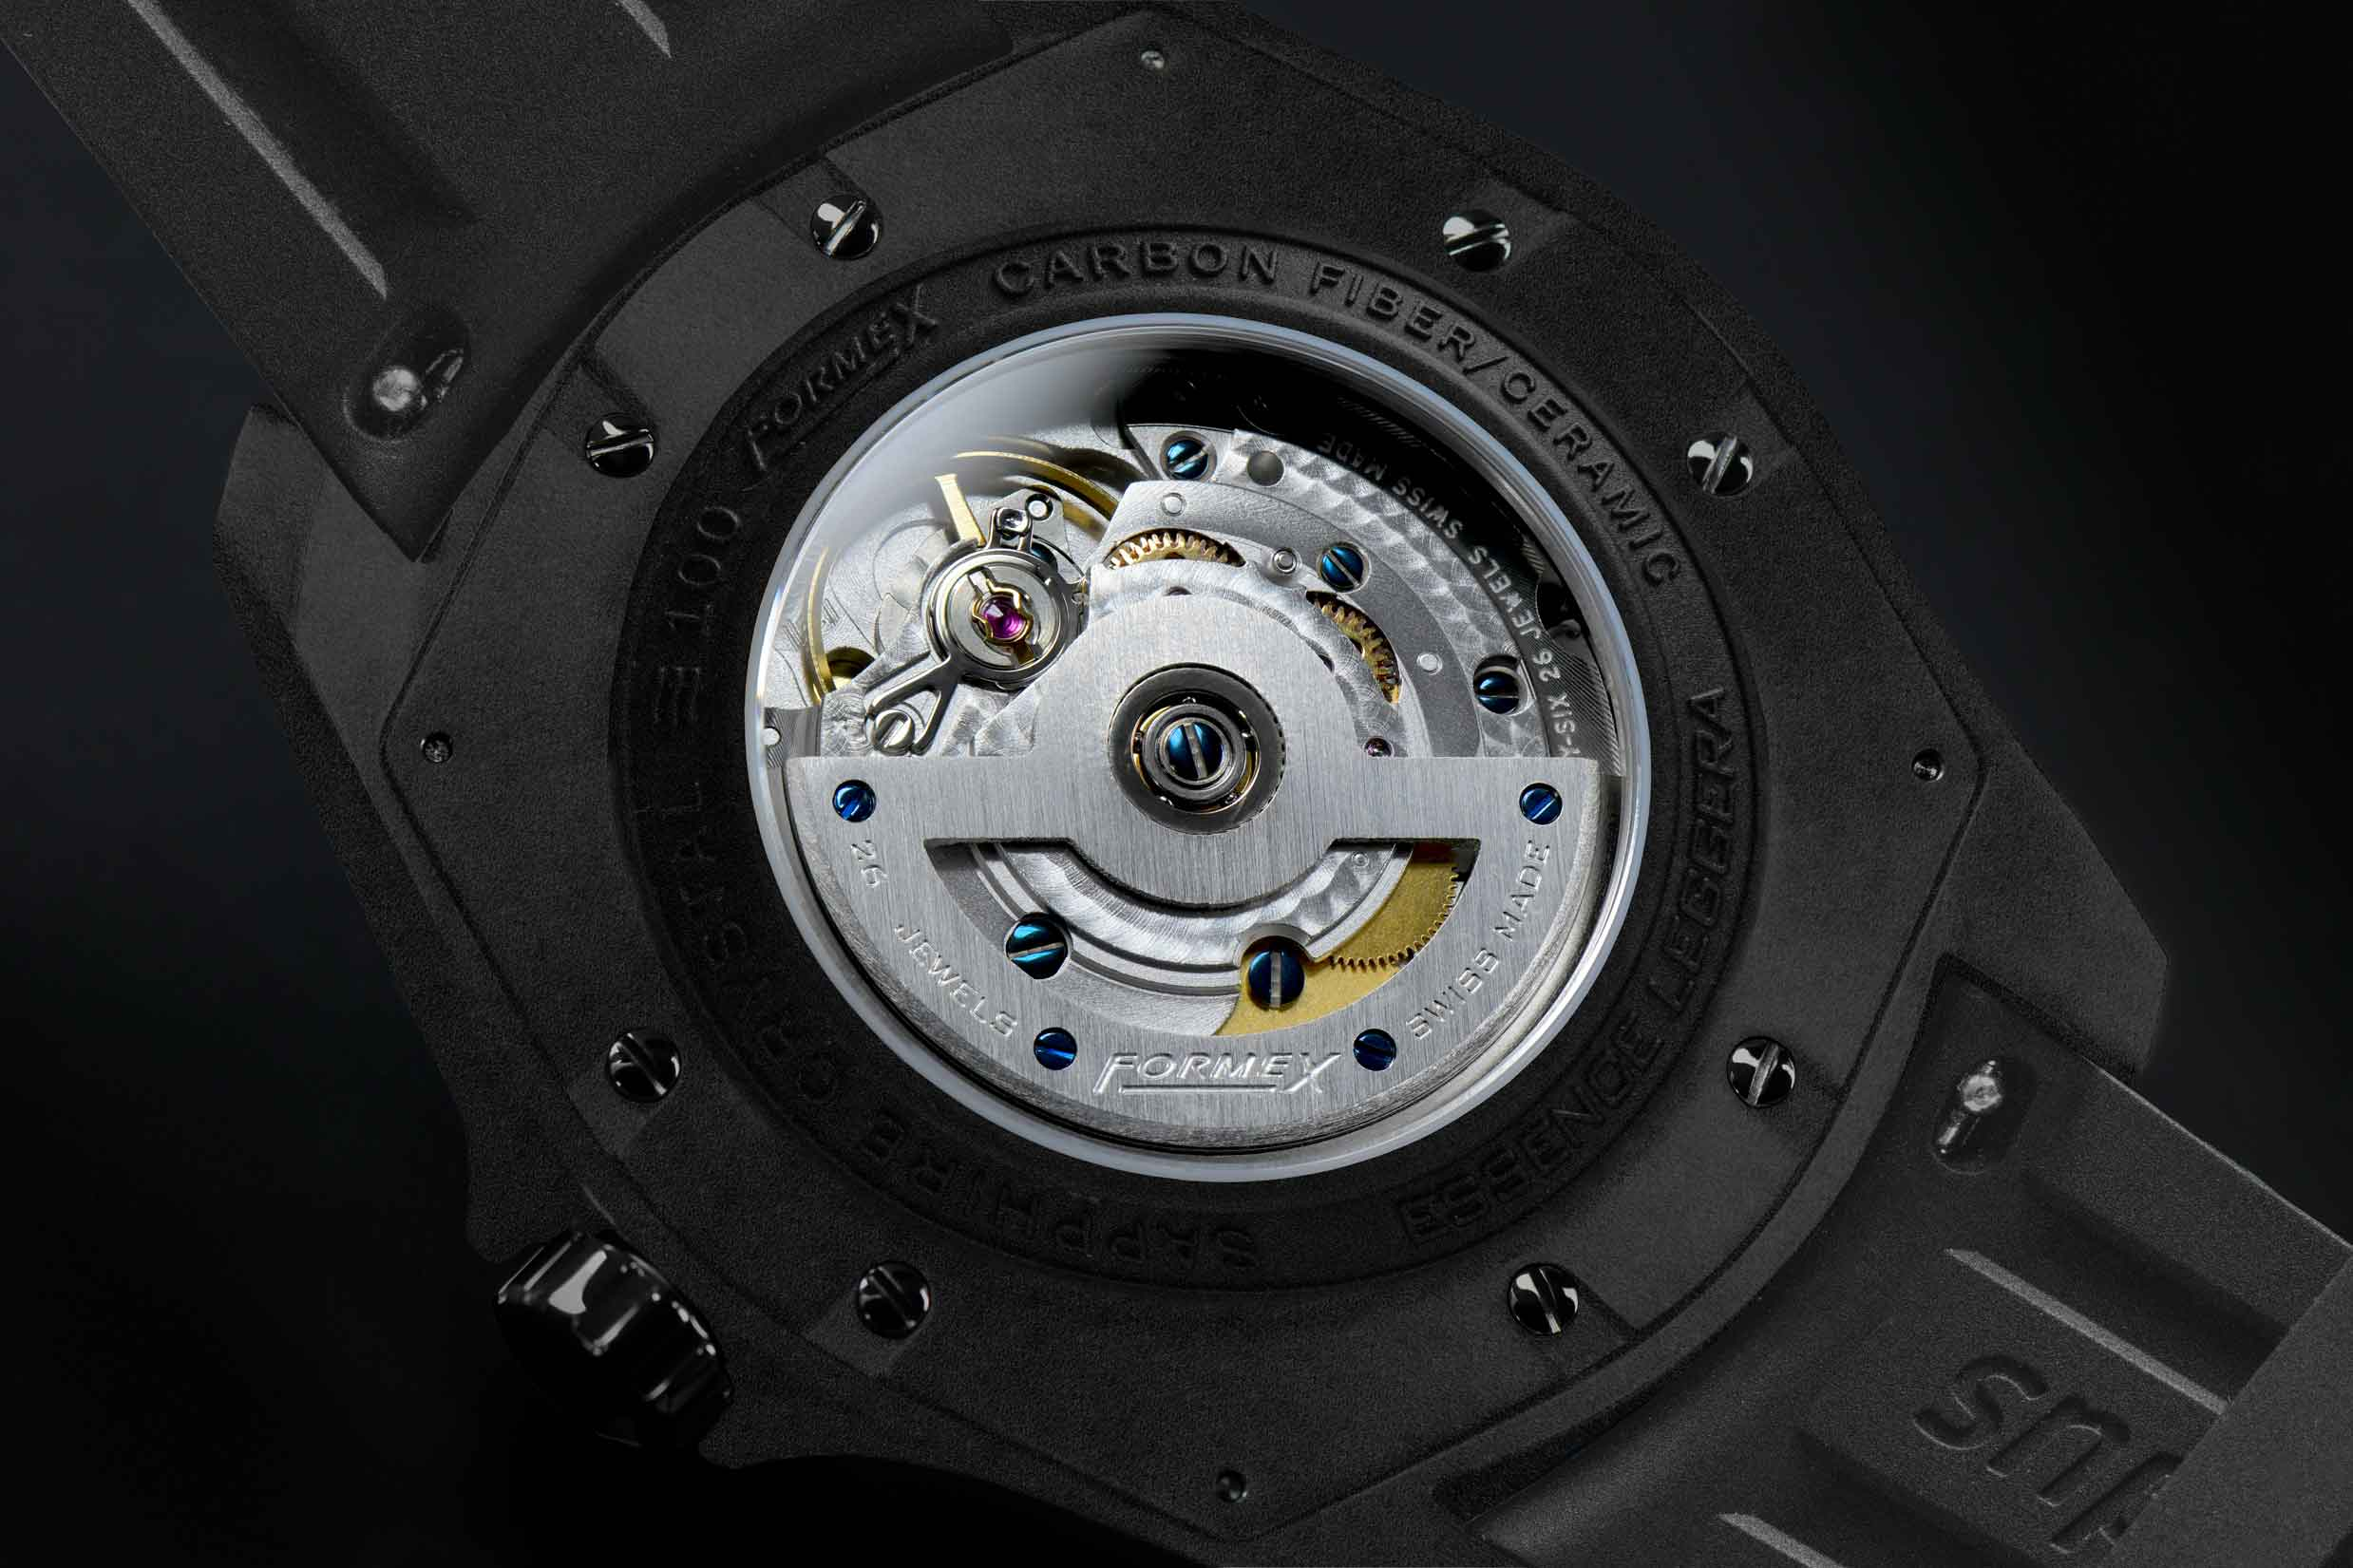 Formex-Essence-LEGGERA-Automatic-Chronometer-FORGED-CARBON-Caseback